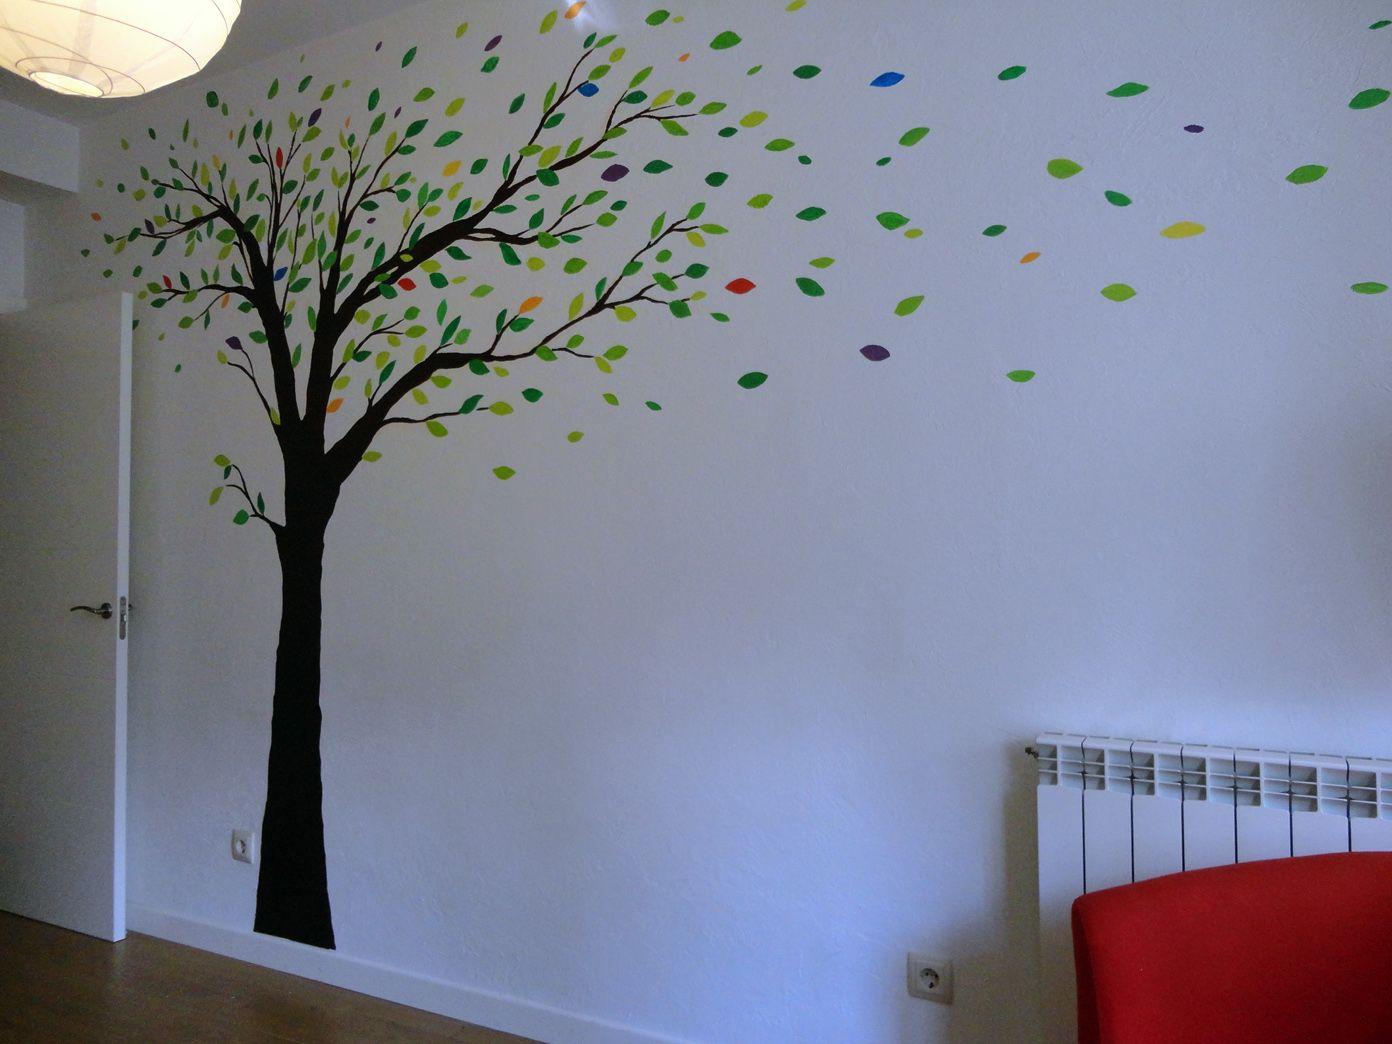 Mural arbol para dormitorio paredes pinterest mural for Pegatinas pared arbol infantil